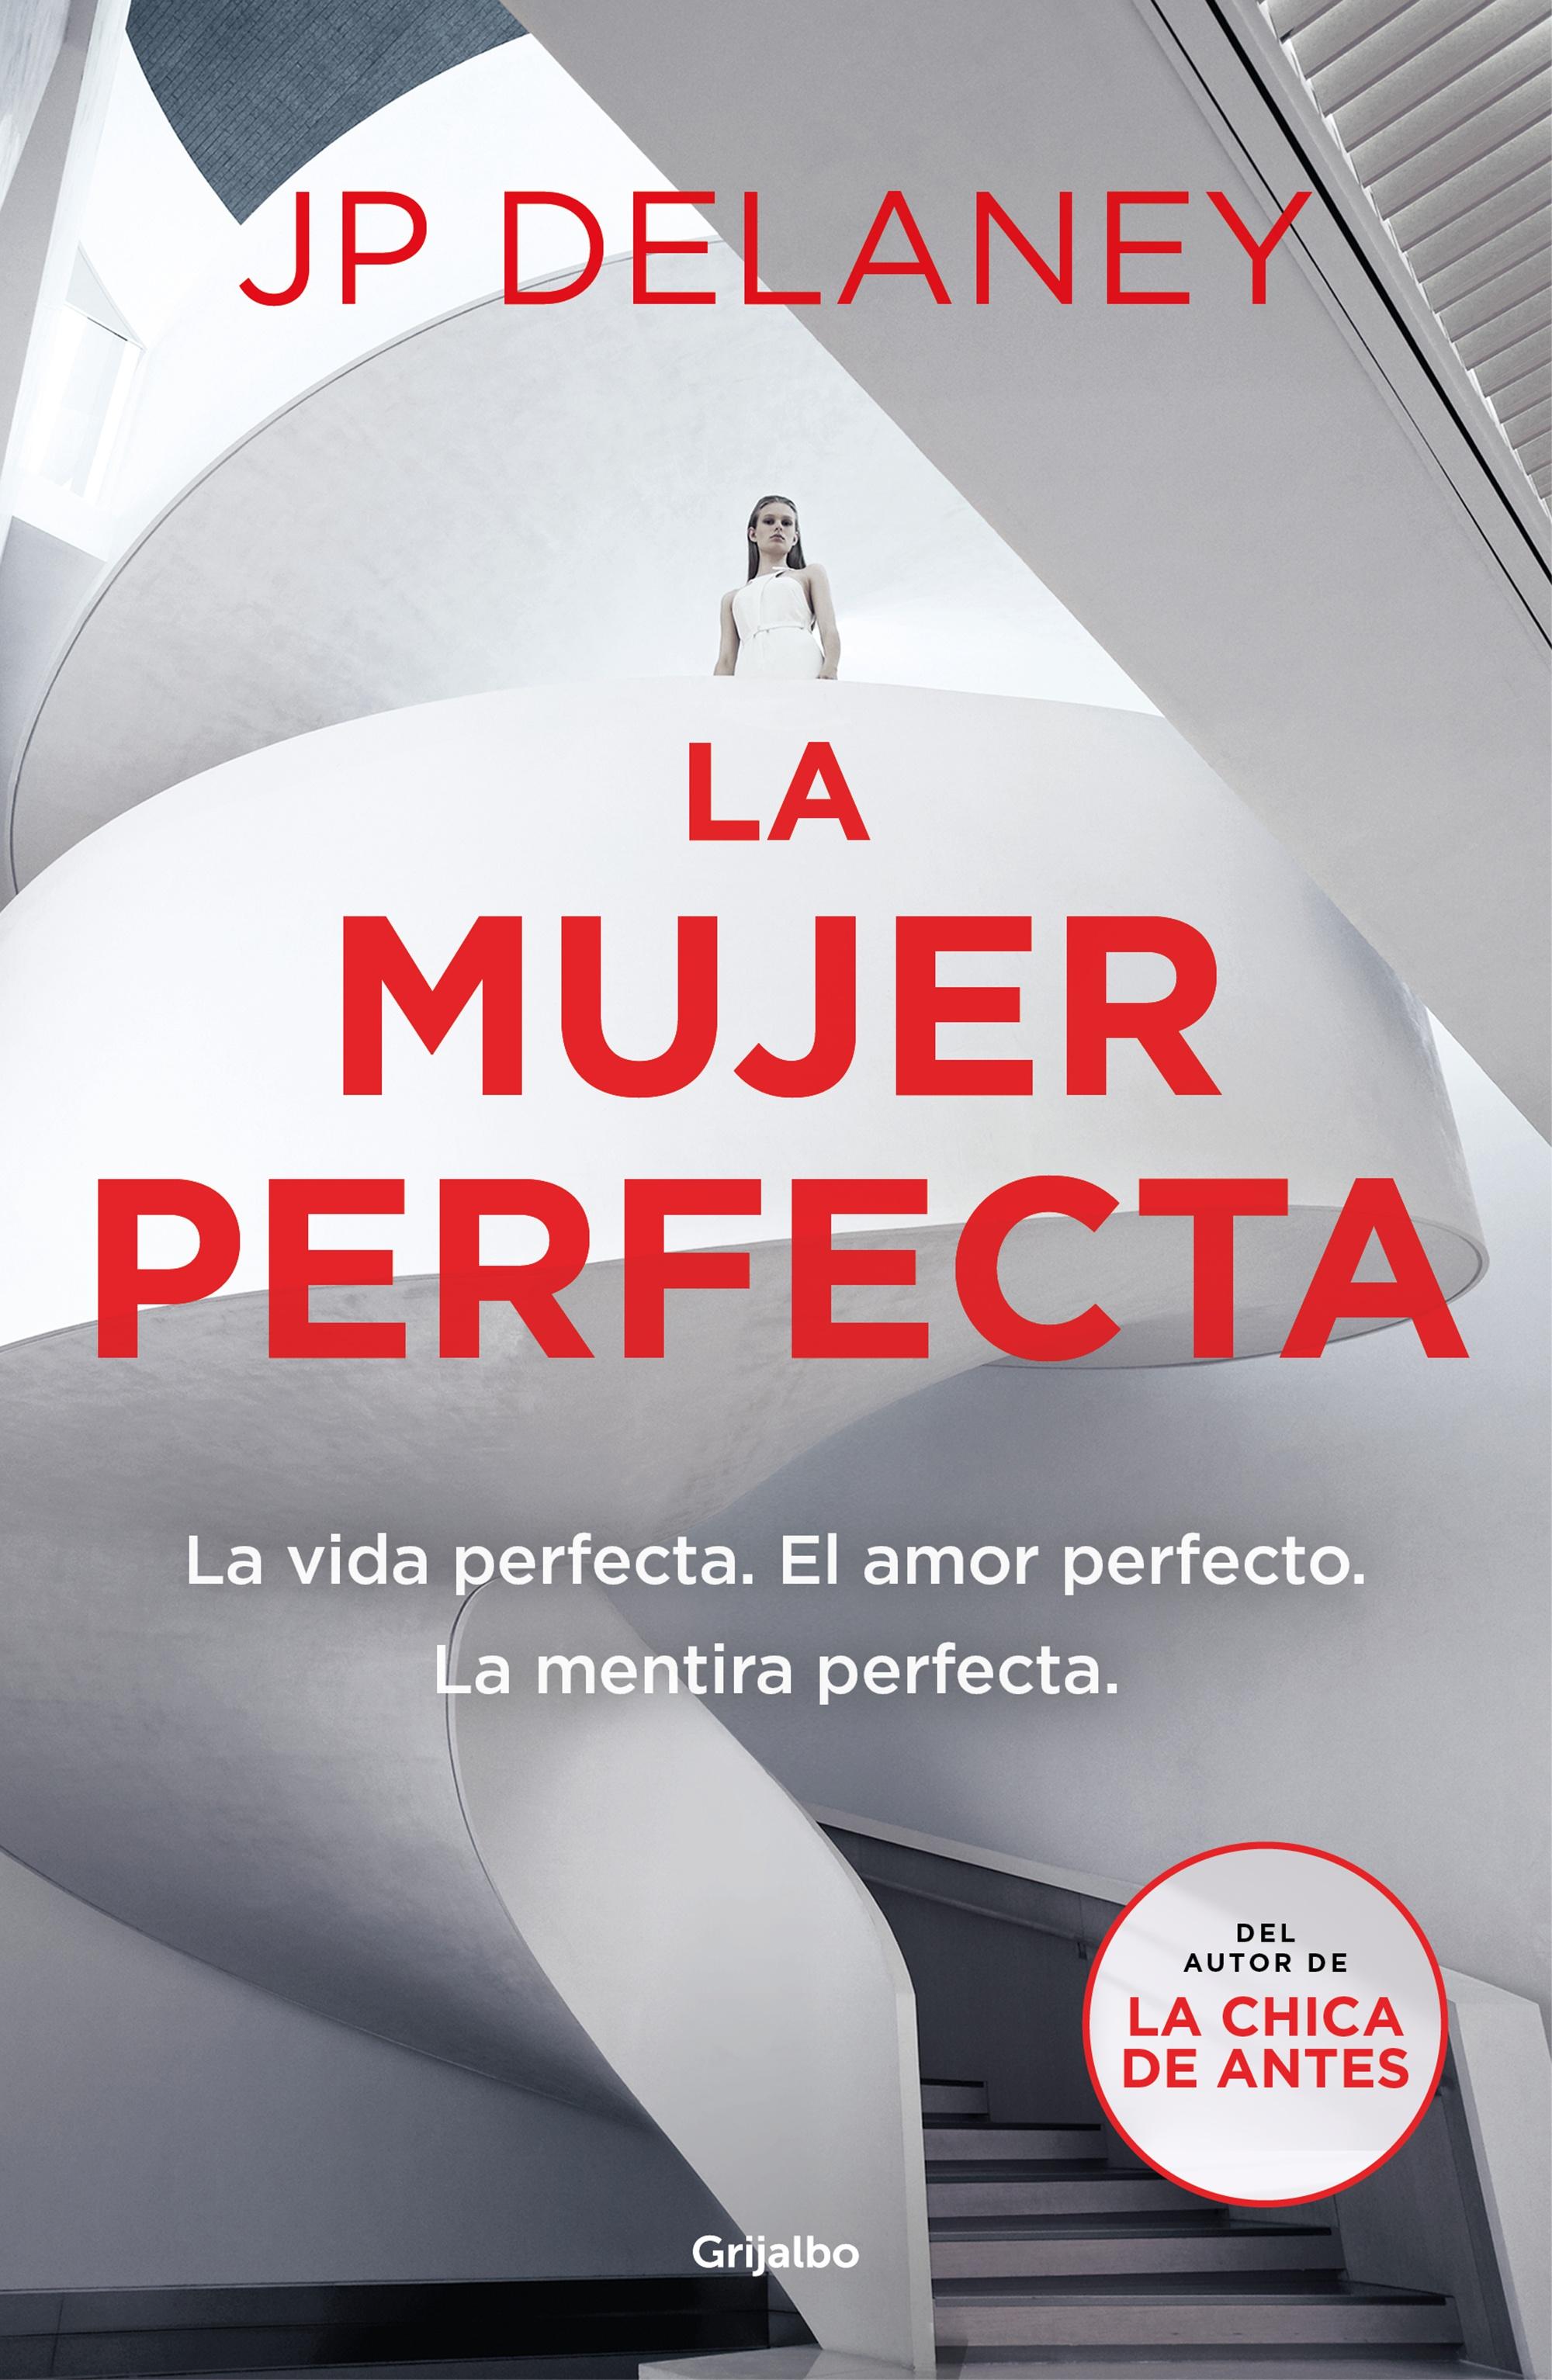 La mujer perfecta